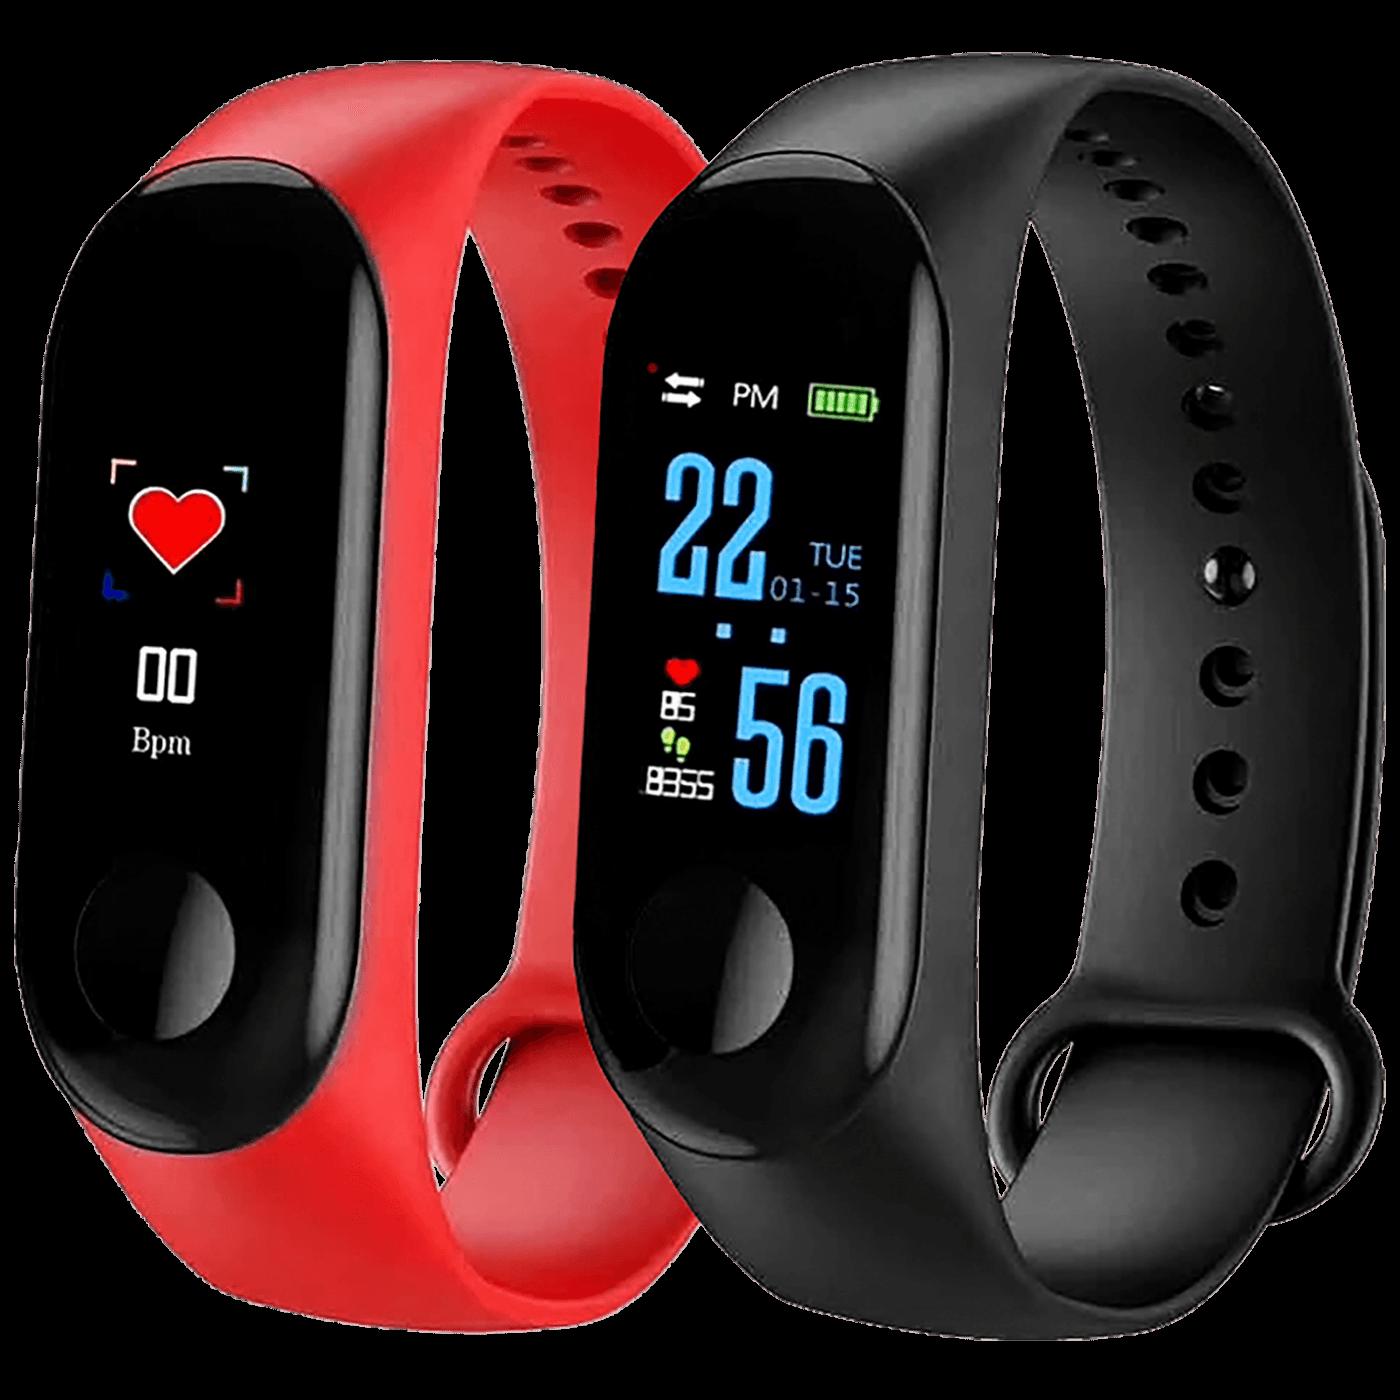 SAT pametni, Fitness, TFT, Bluetooth